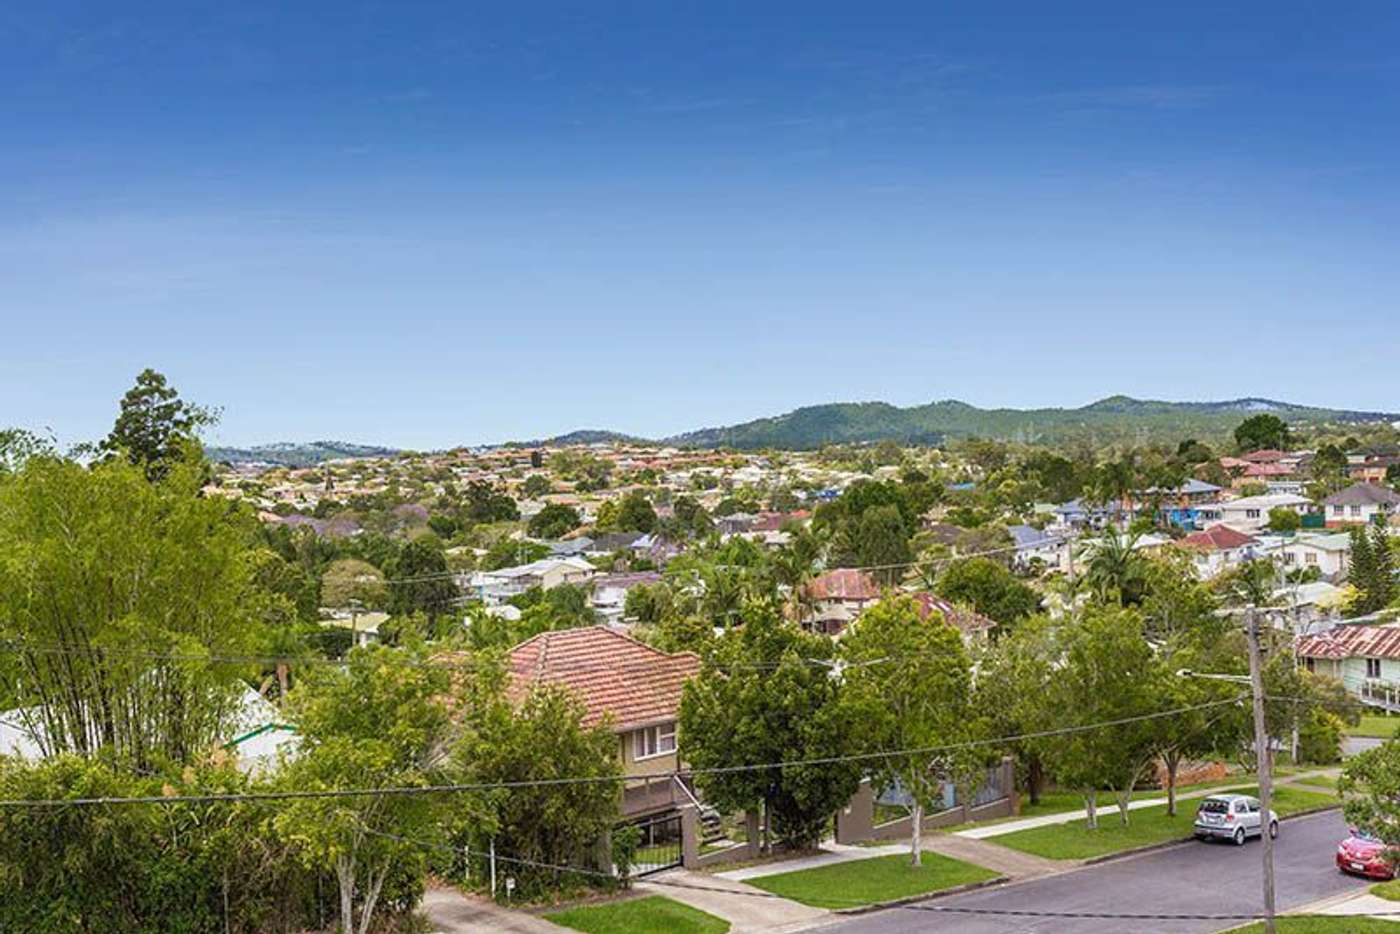 Main view of Homely house listing, 139 Wanda Road, Upper Mount Gravatt QLD 4122